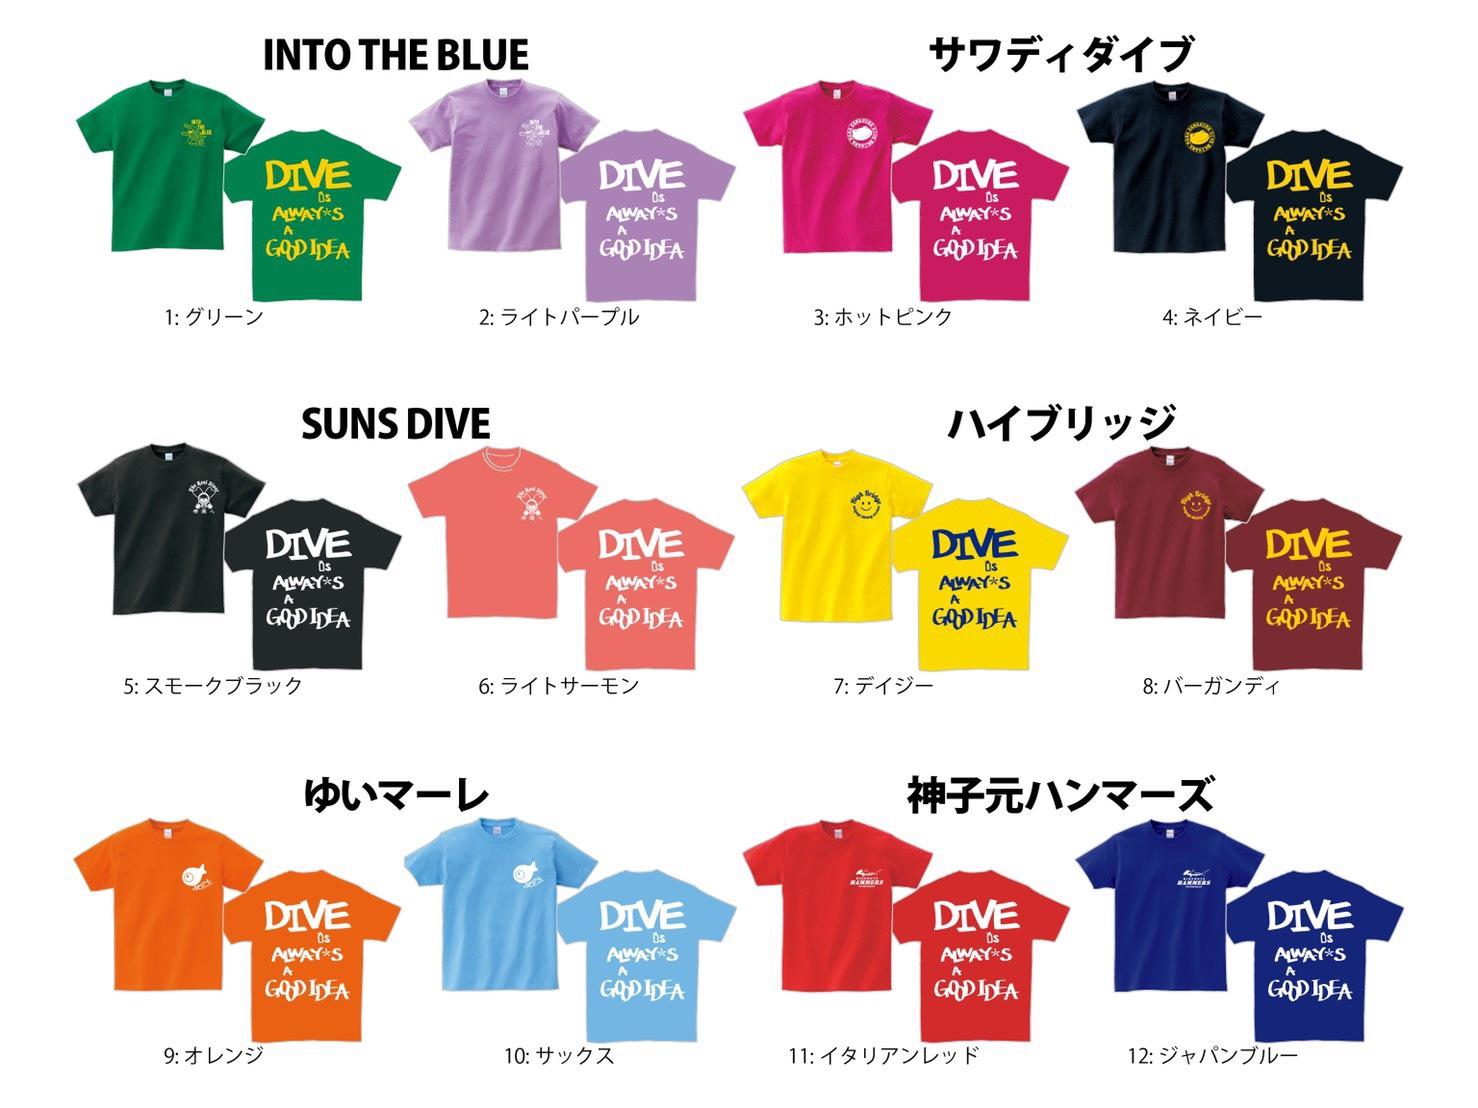 《 Dive is always a good idea. 》コラボTシャツ販売!